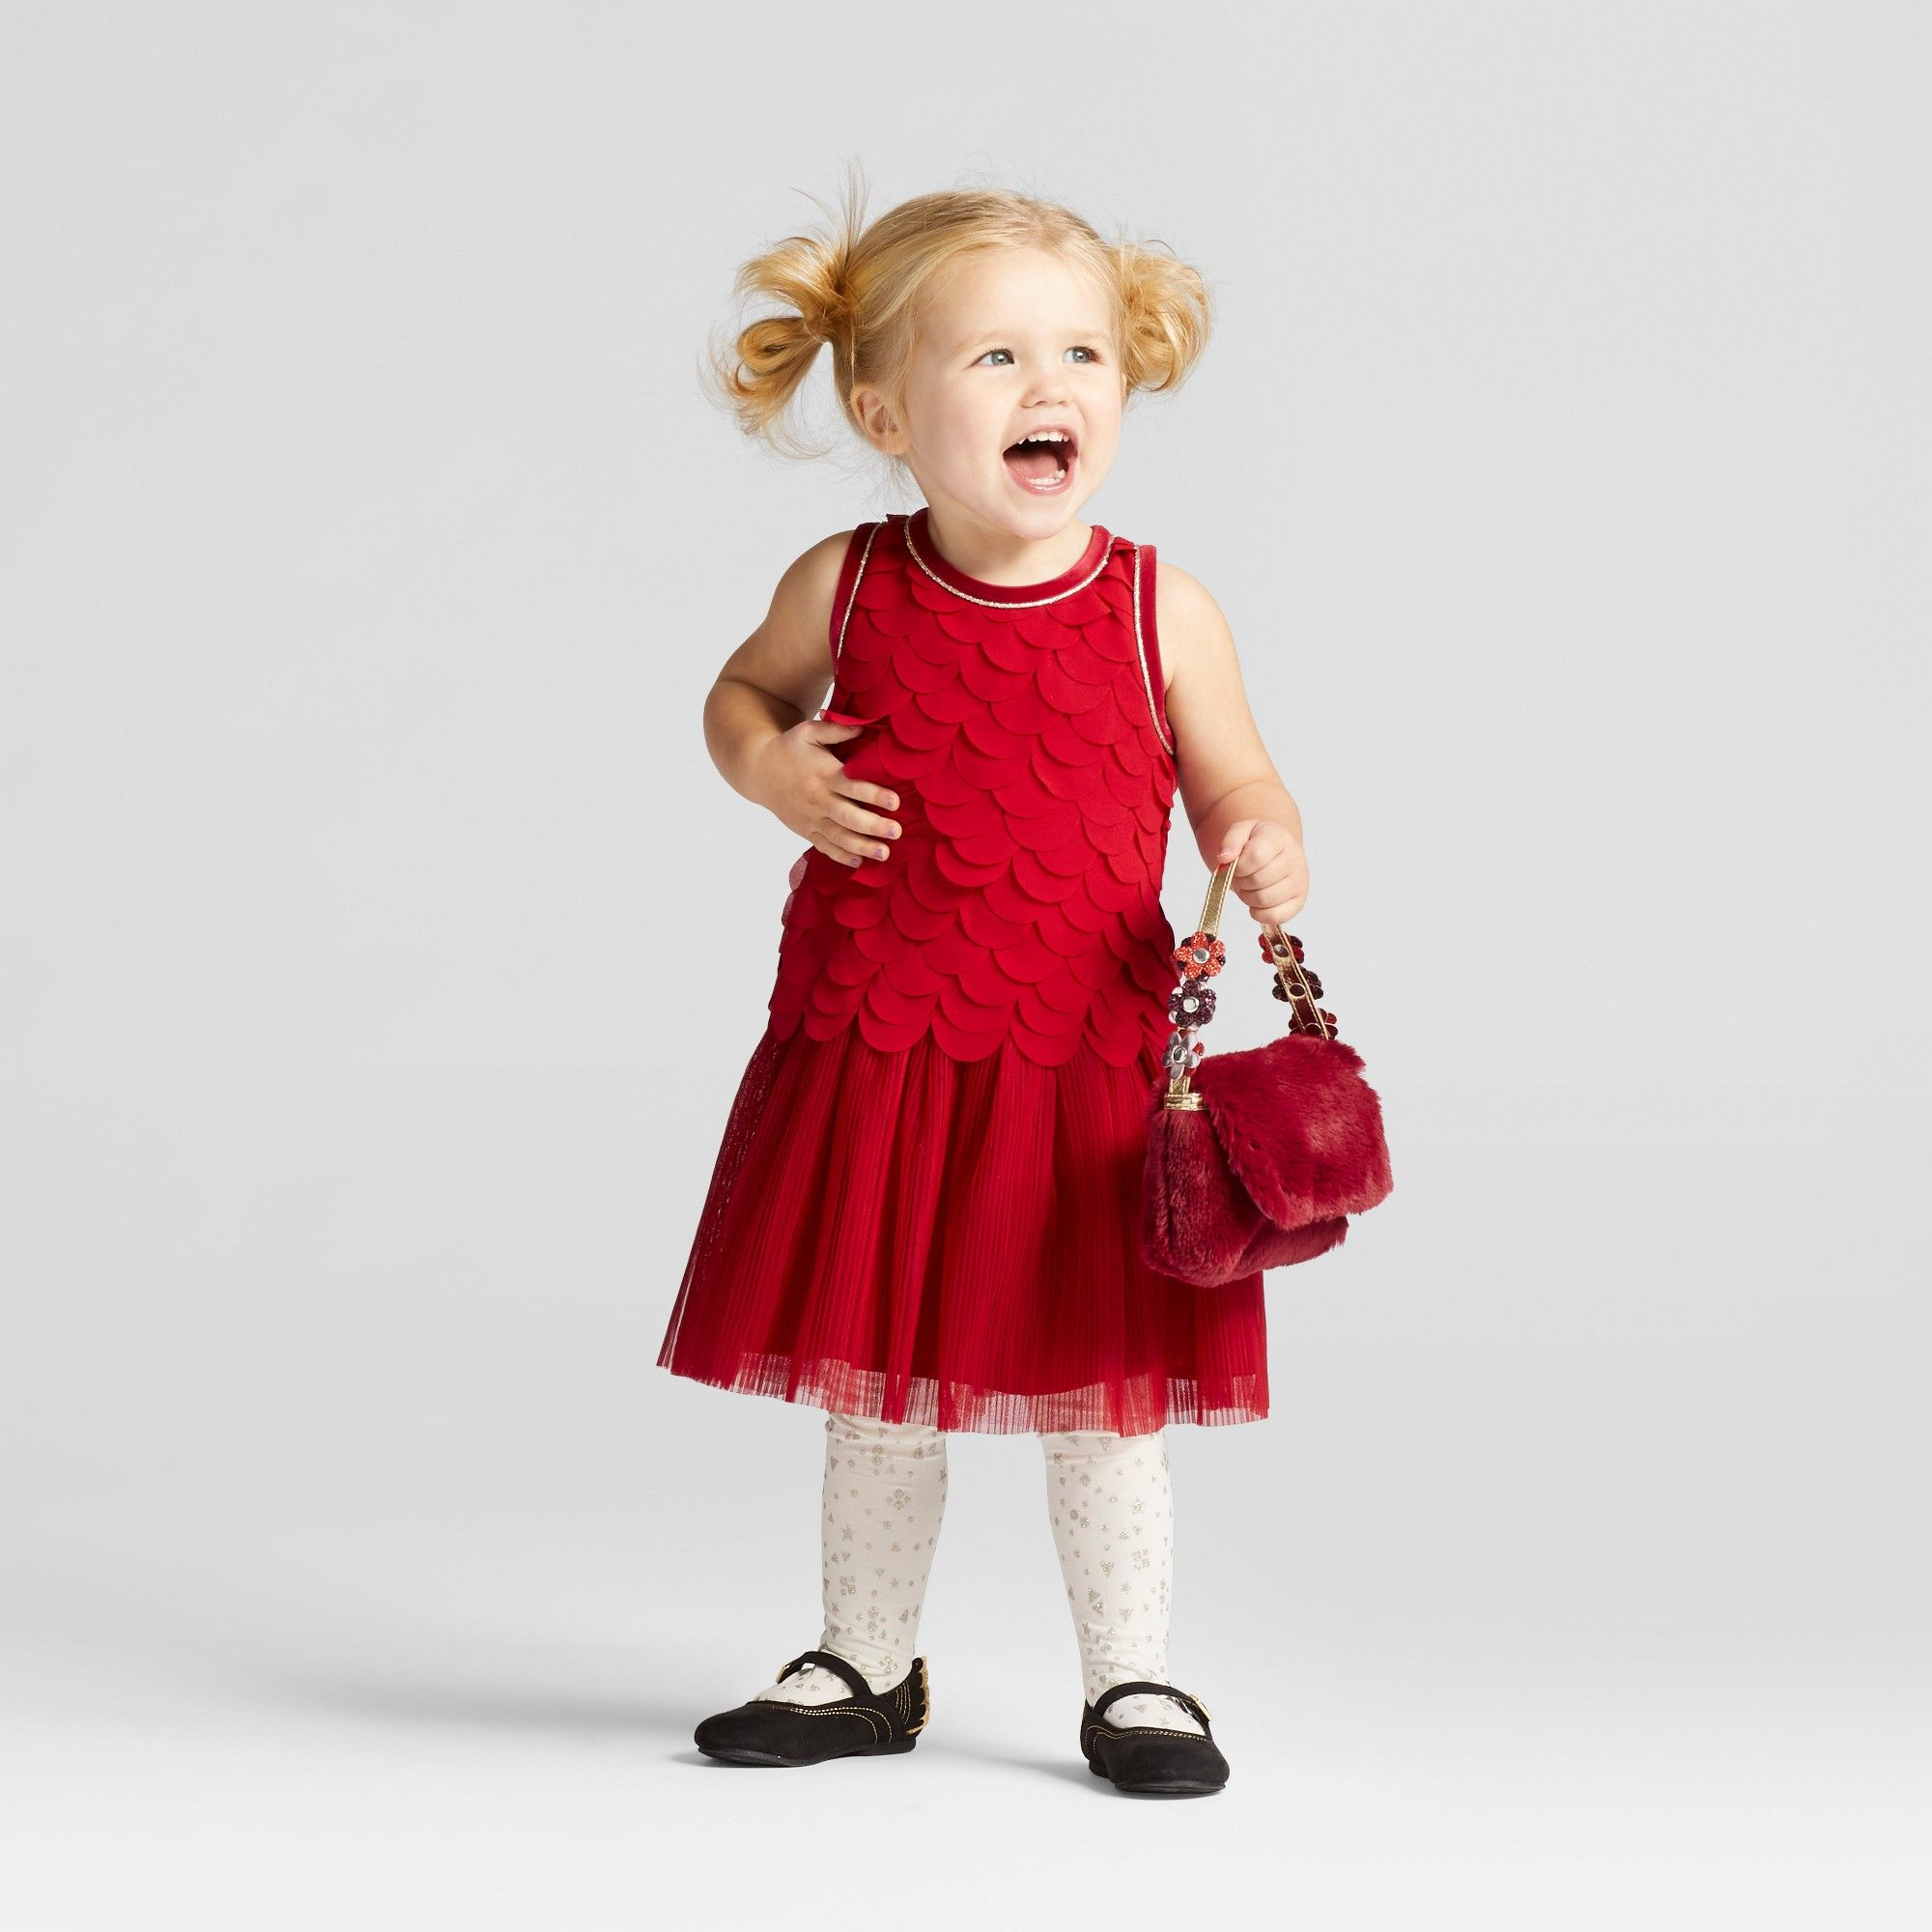 c48699a3942 Toddler Girls  Scallop A Line Dress Cat   Jack Red Velvet 18 M ...